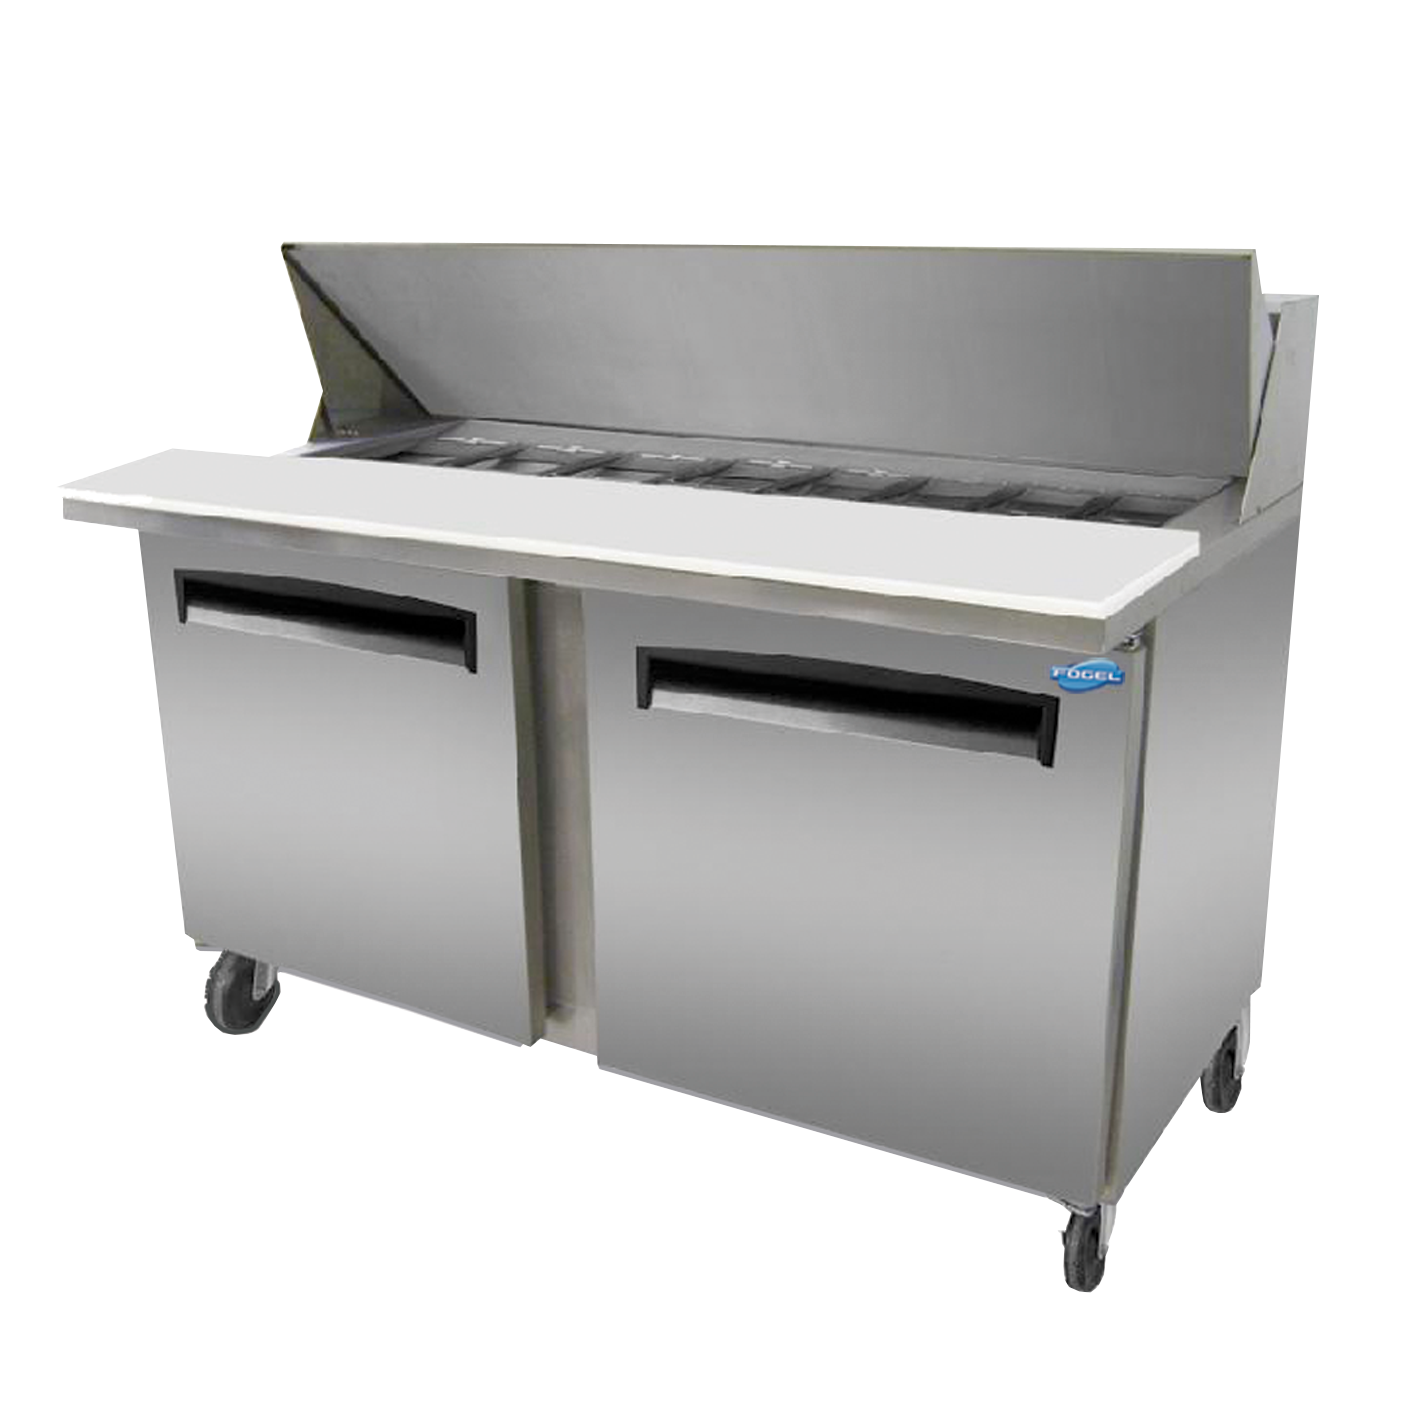 Fogel USA SFLP-59-24 refrigerated counter, mega top sandwich / salad unit